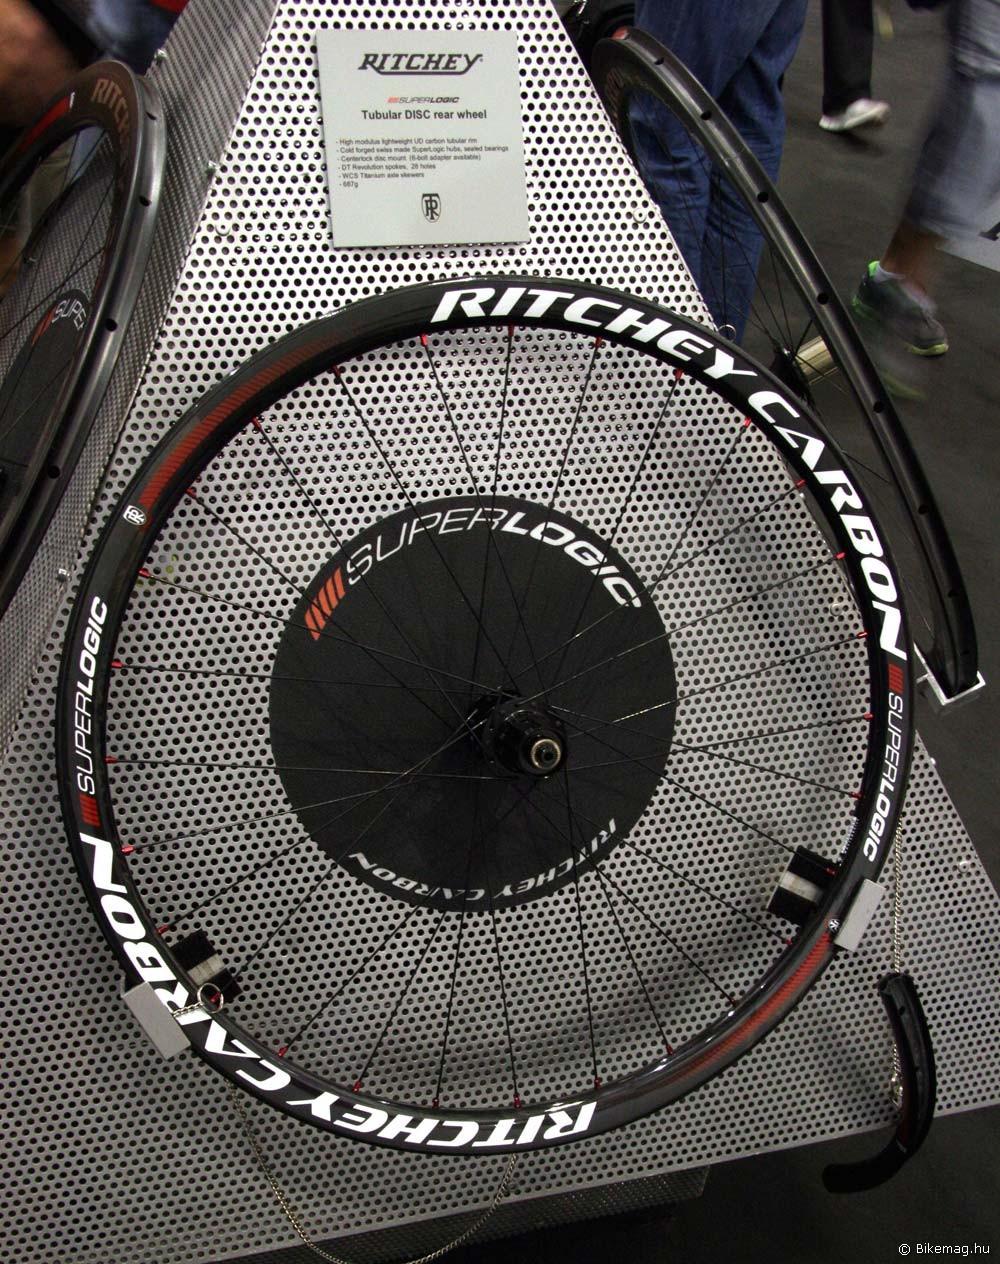 Eurobike 2011: Ritchey Superlogic Tubular Disc